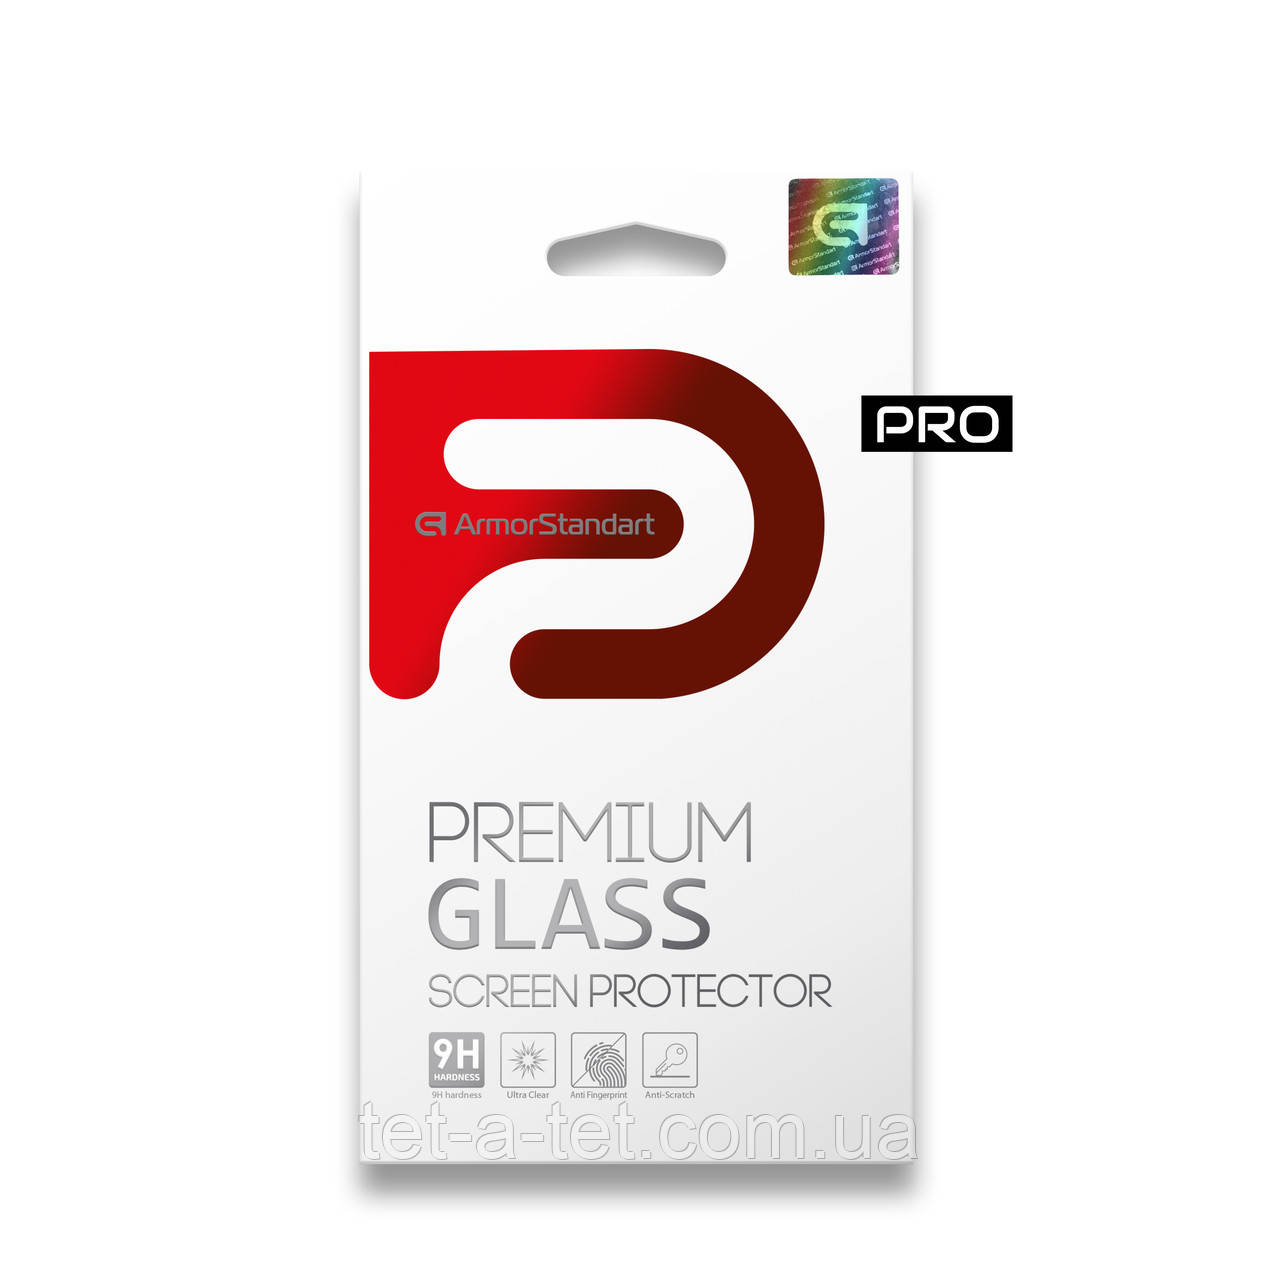 Захисне скло ArmorStandart Pro для Samsung A21s Black (premium glass)